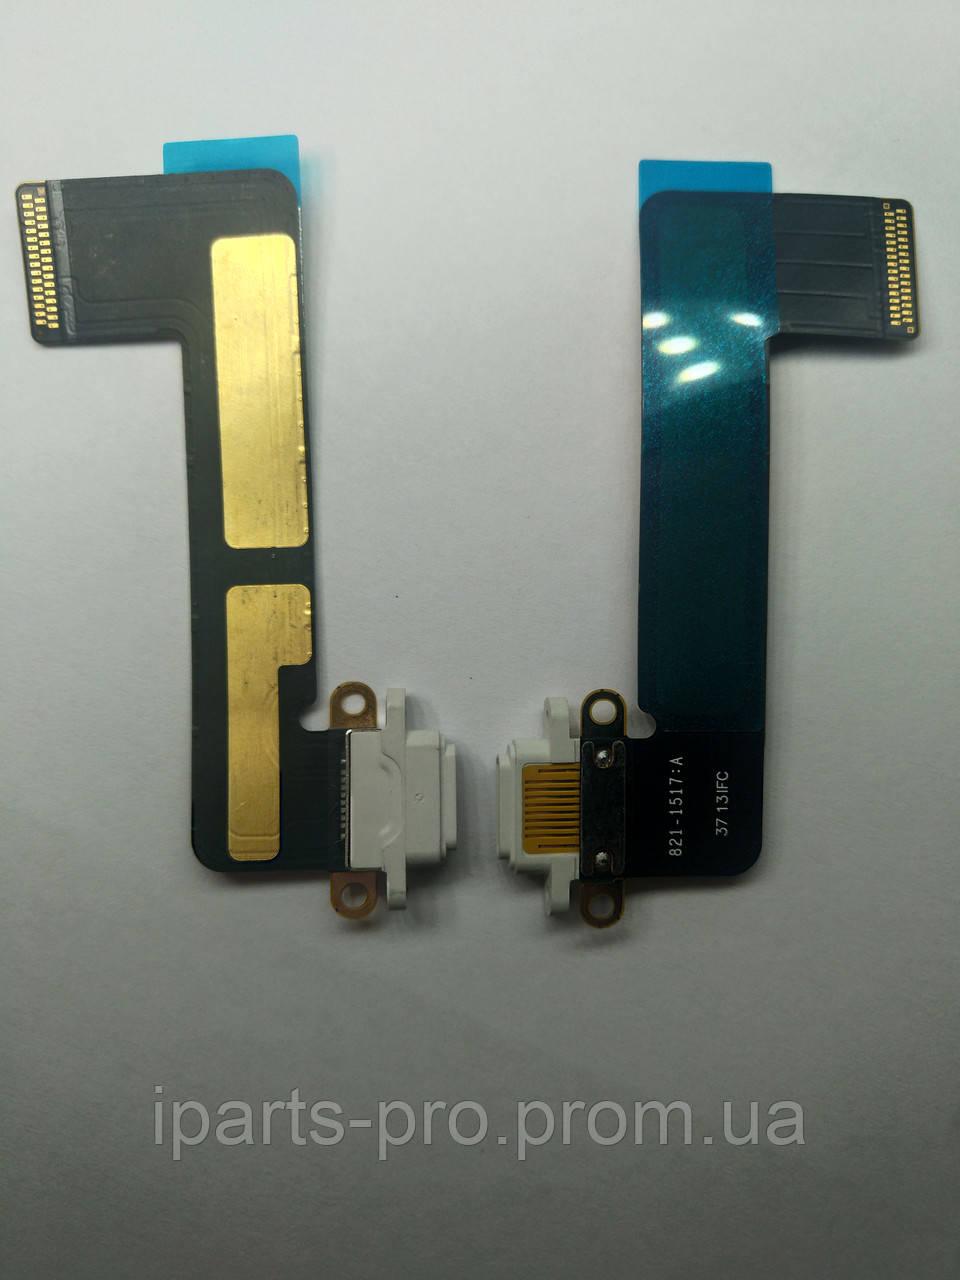 Шлейф для iPad mini Charge БЕЛЫЙ